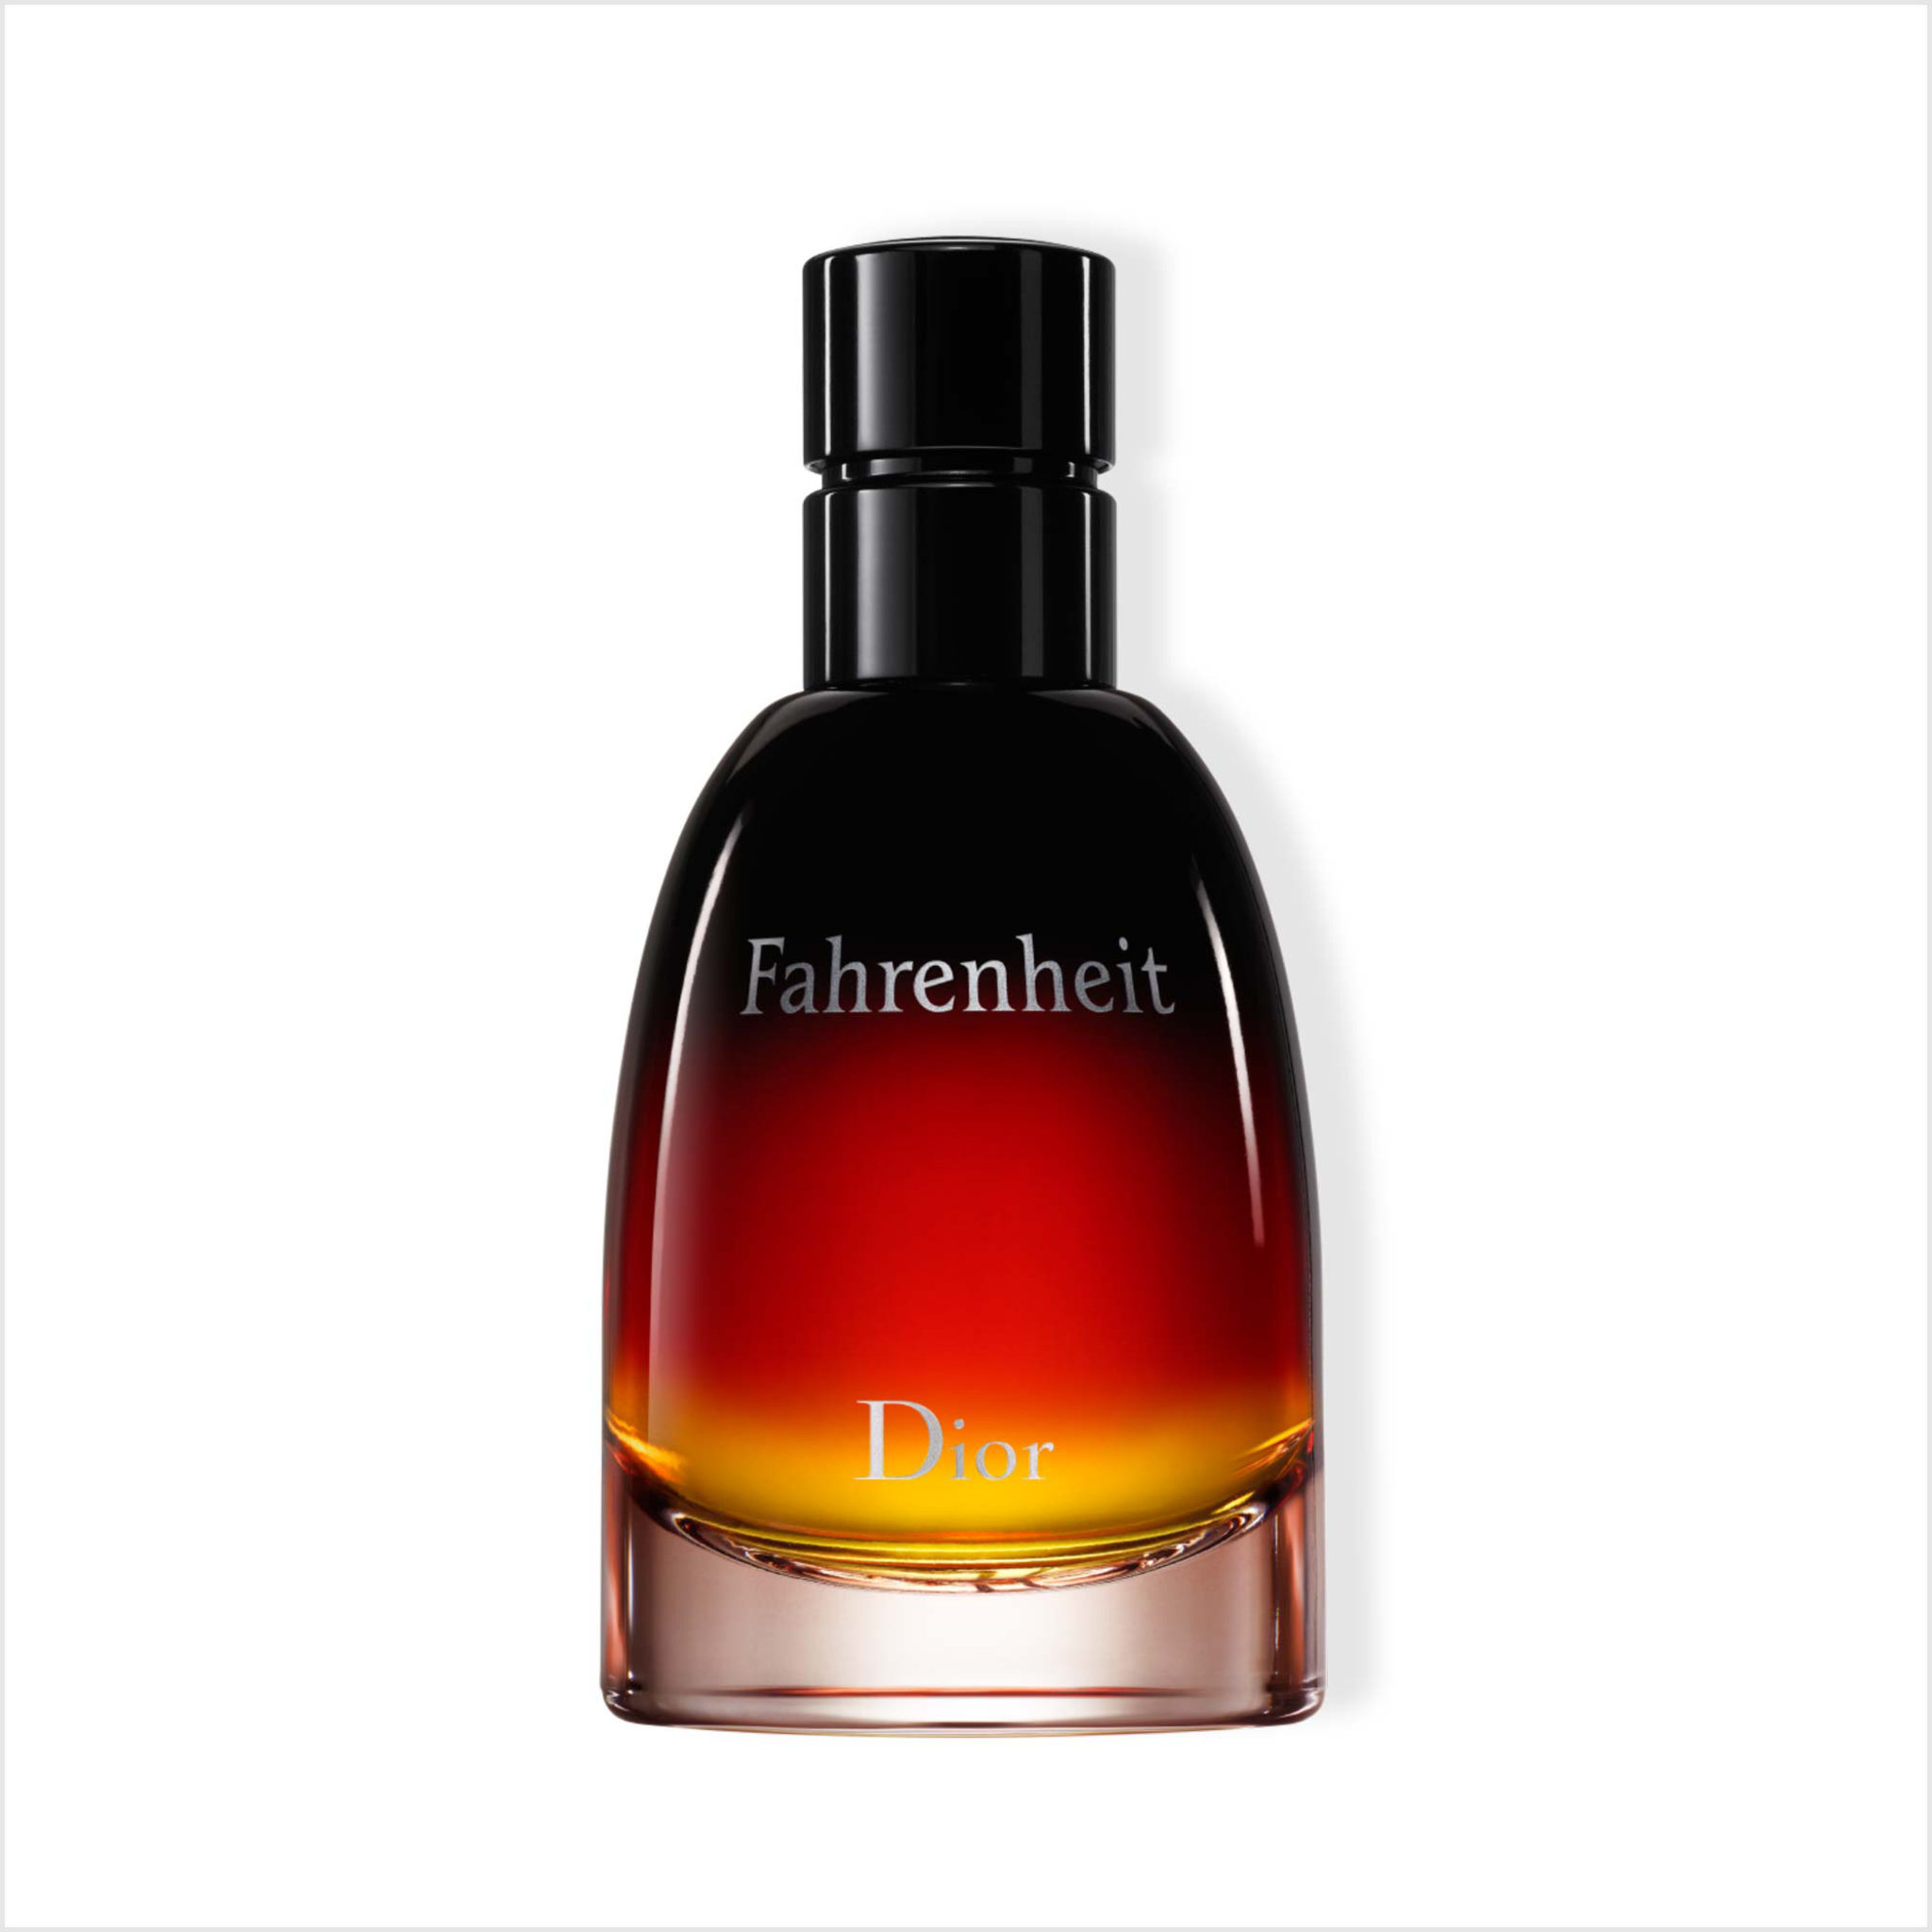 Fahrenheit Le Parfum, 75 ML